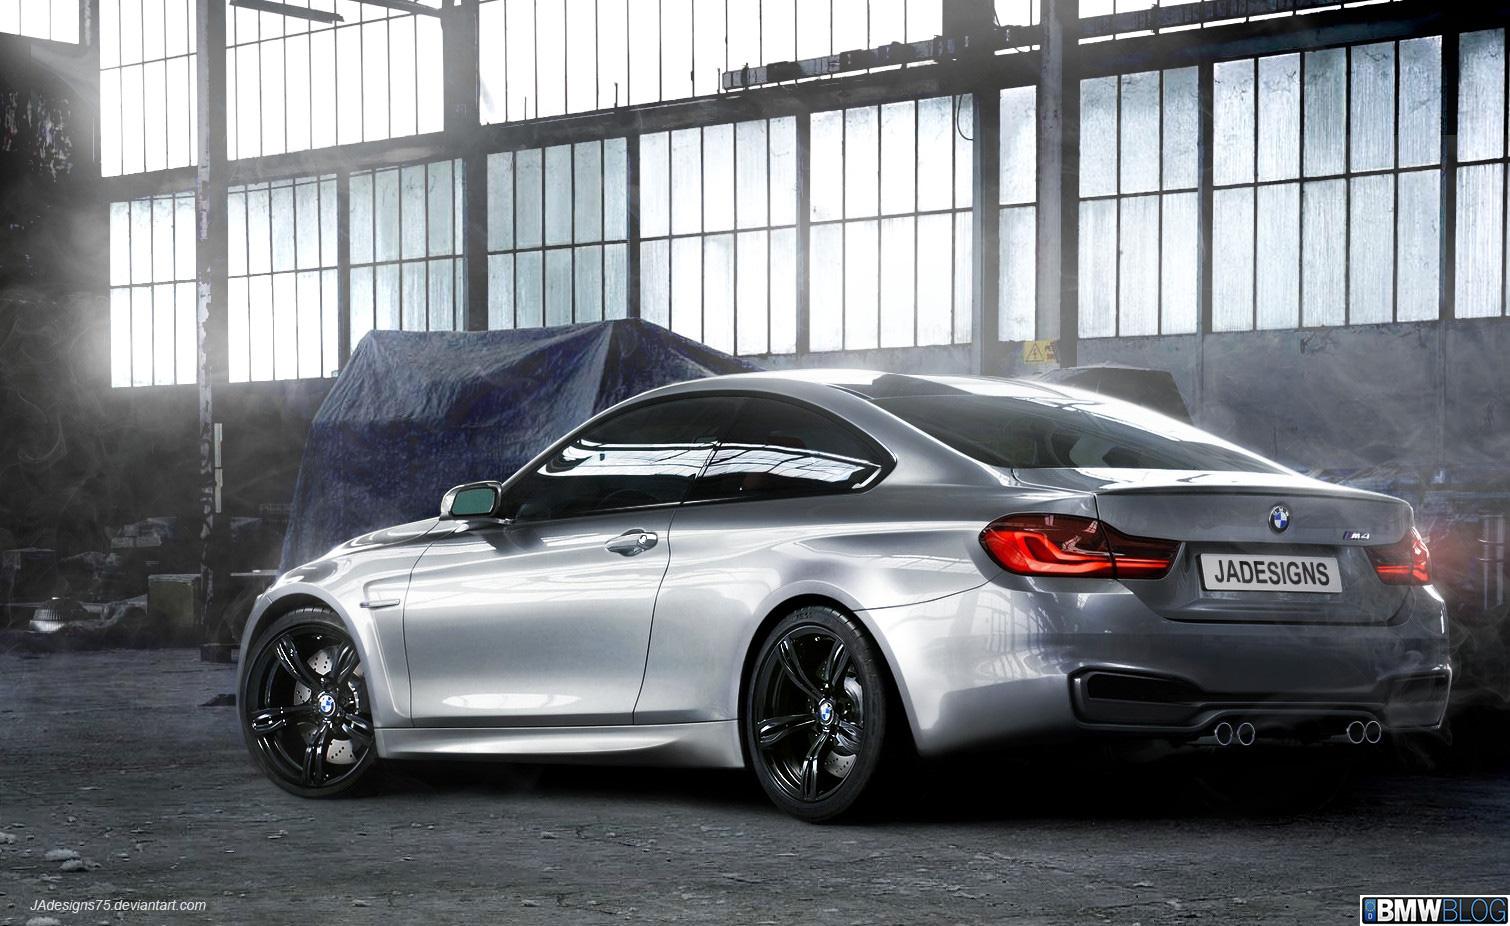 Bmw Car 2014 Price For 2014 Bmw m4 Price